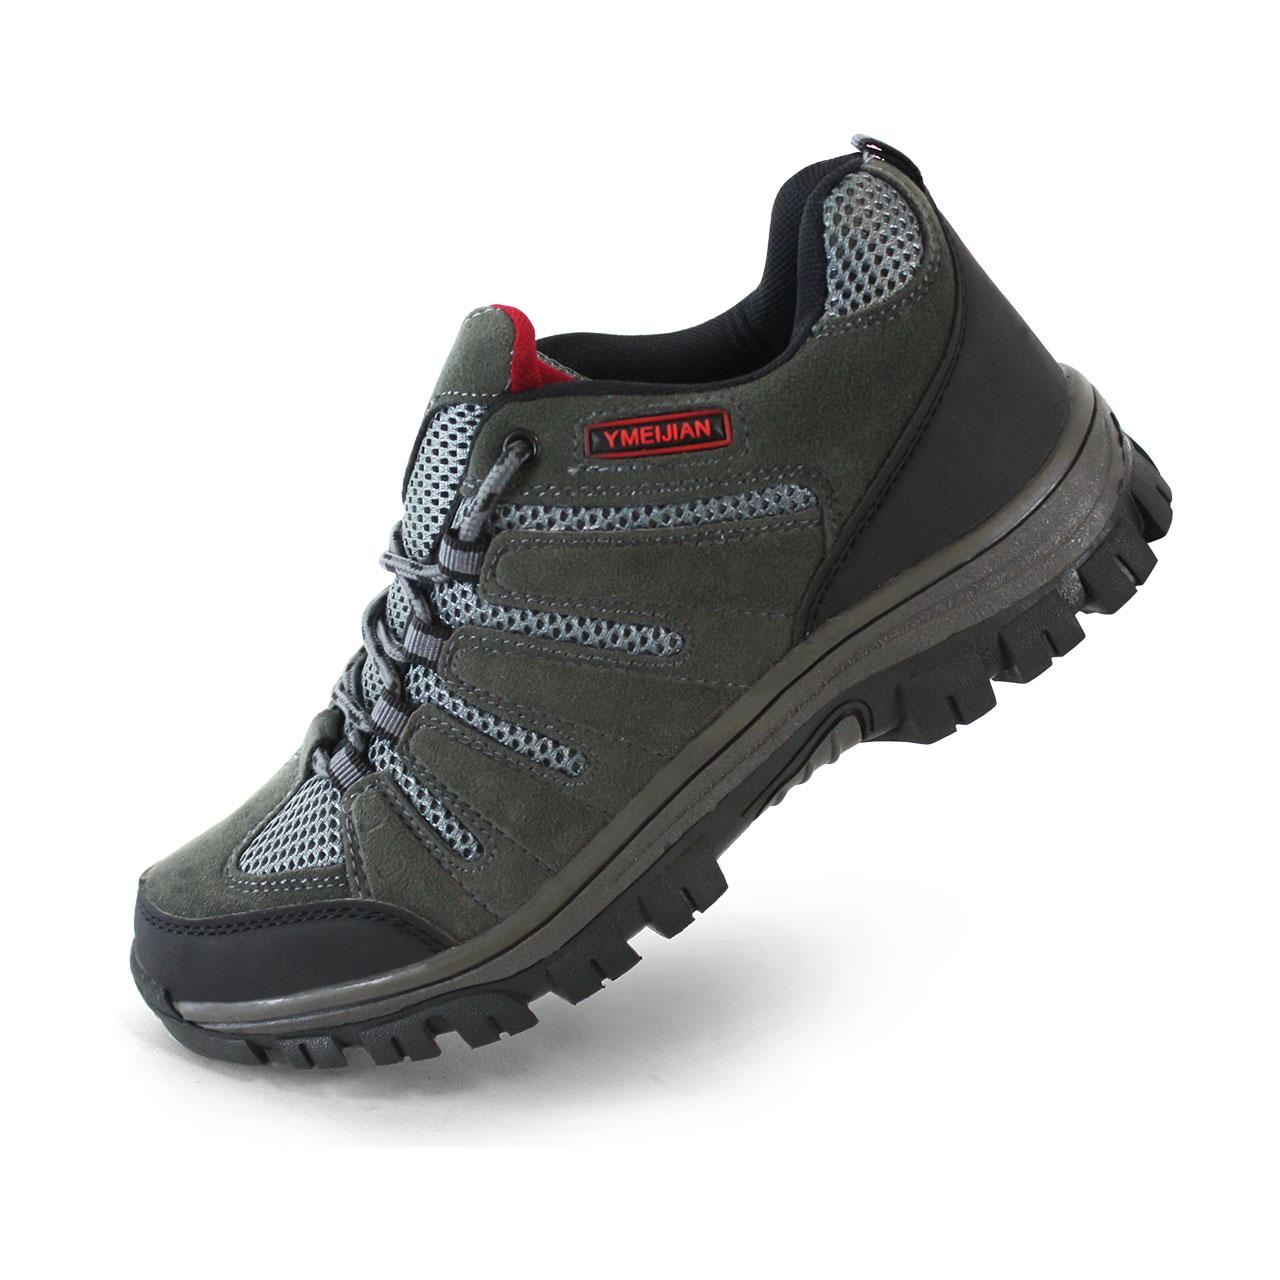 Men's Athletic Round Toe Breathable Shoes Green/Gray/Khaki